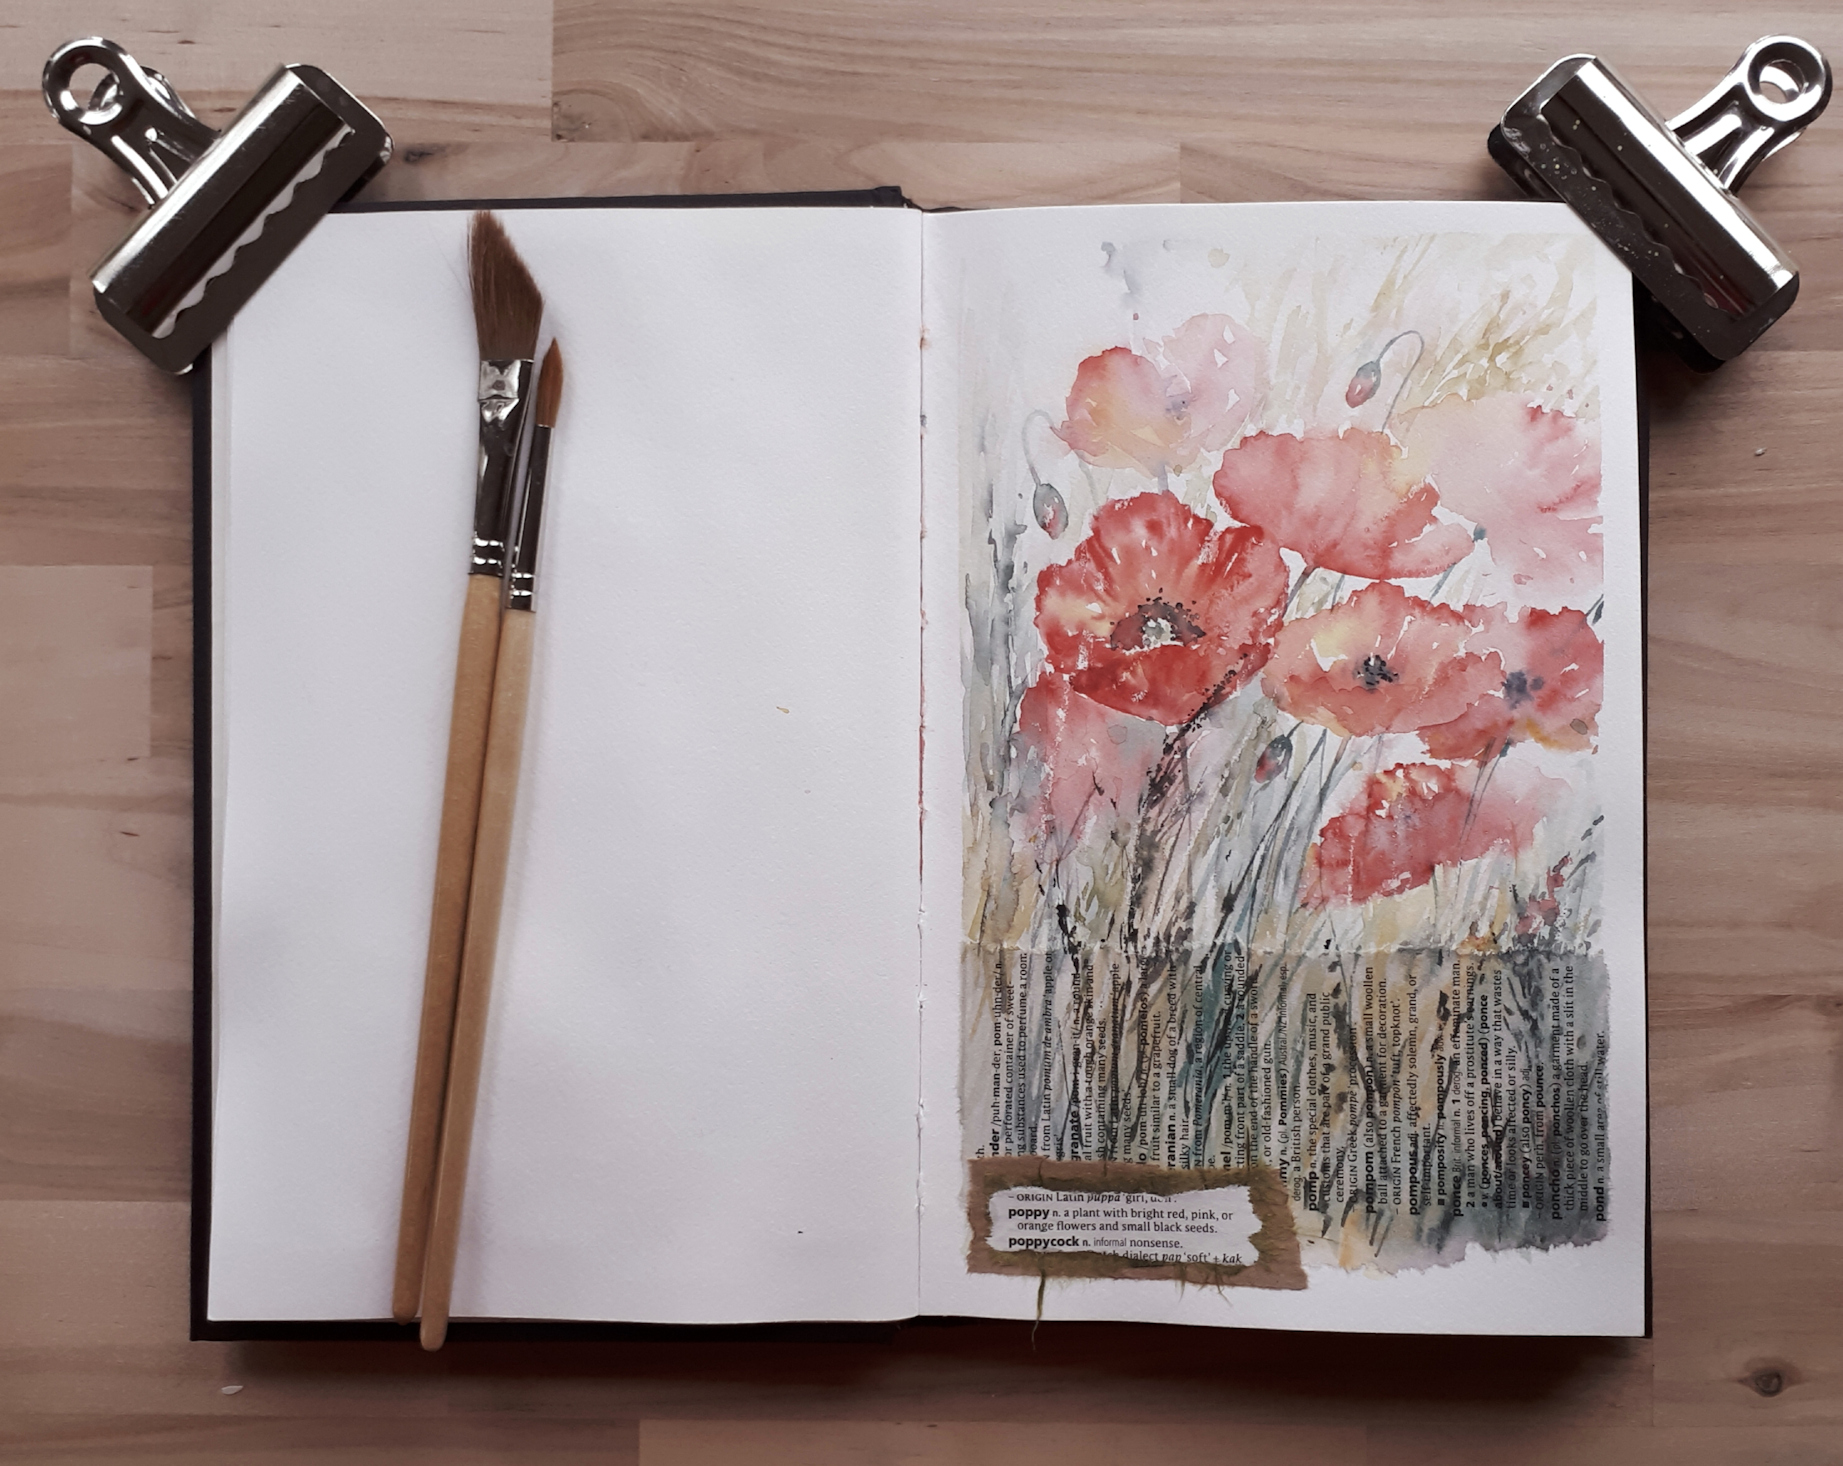 Poppy sketch in Strathmore 500 series sketchbook